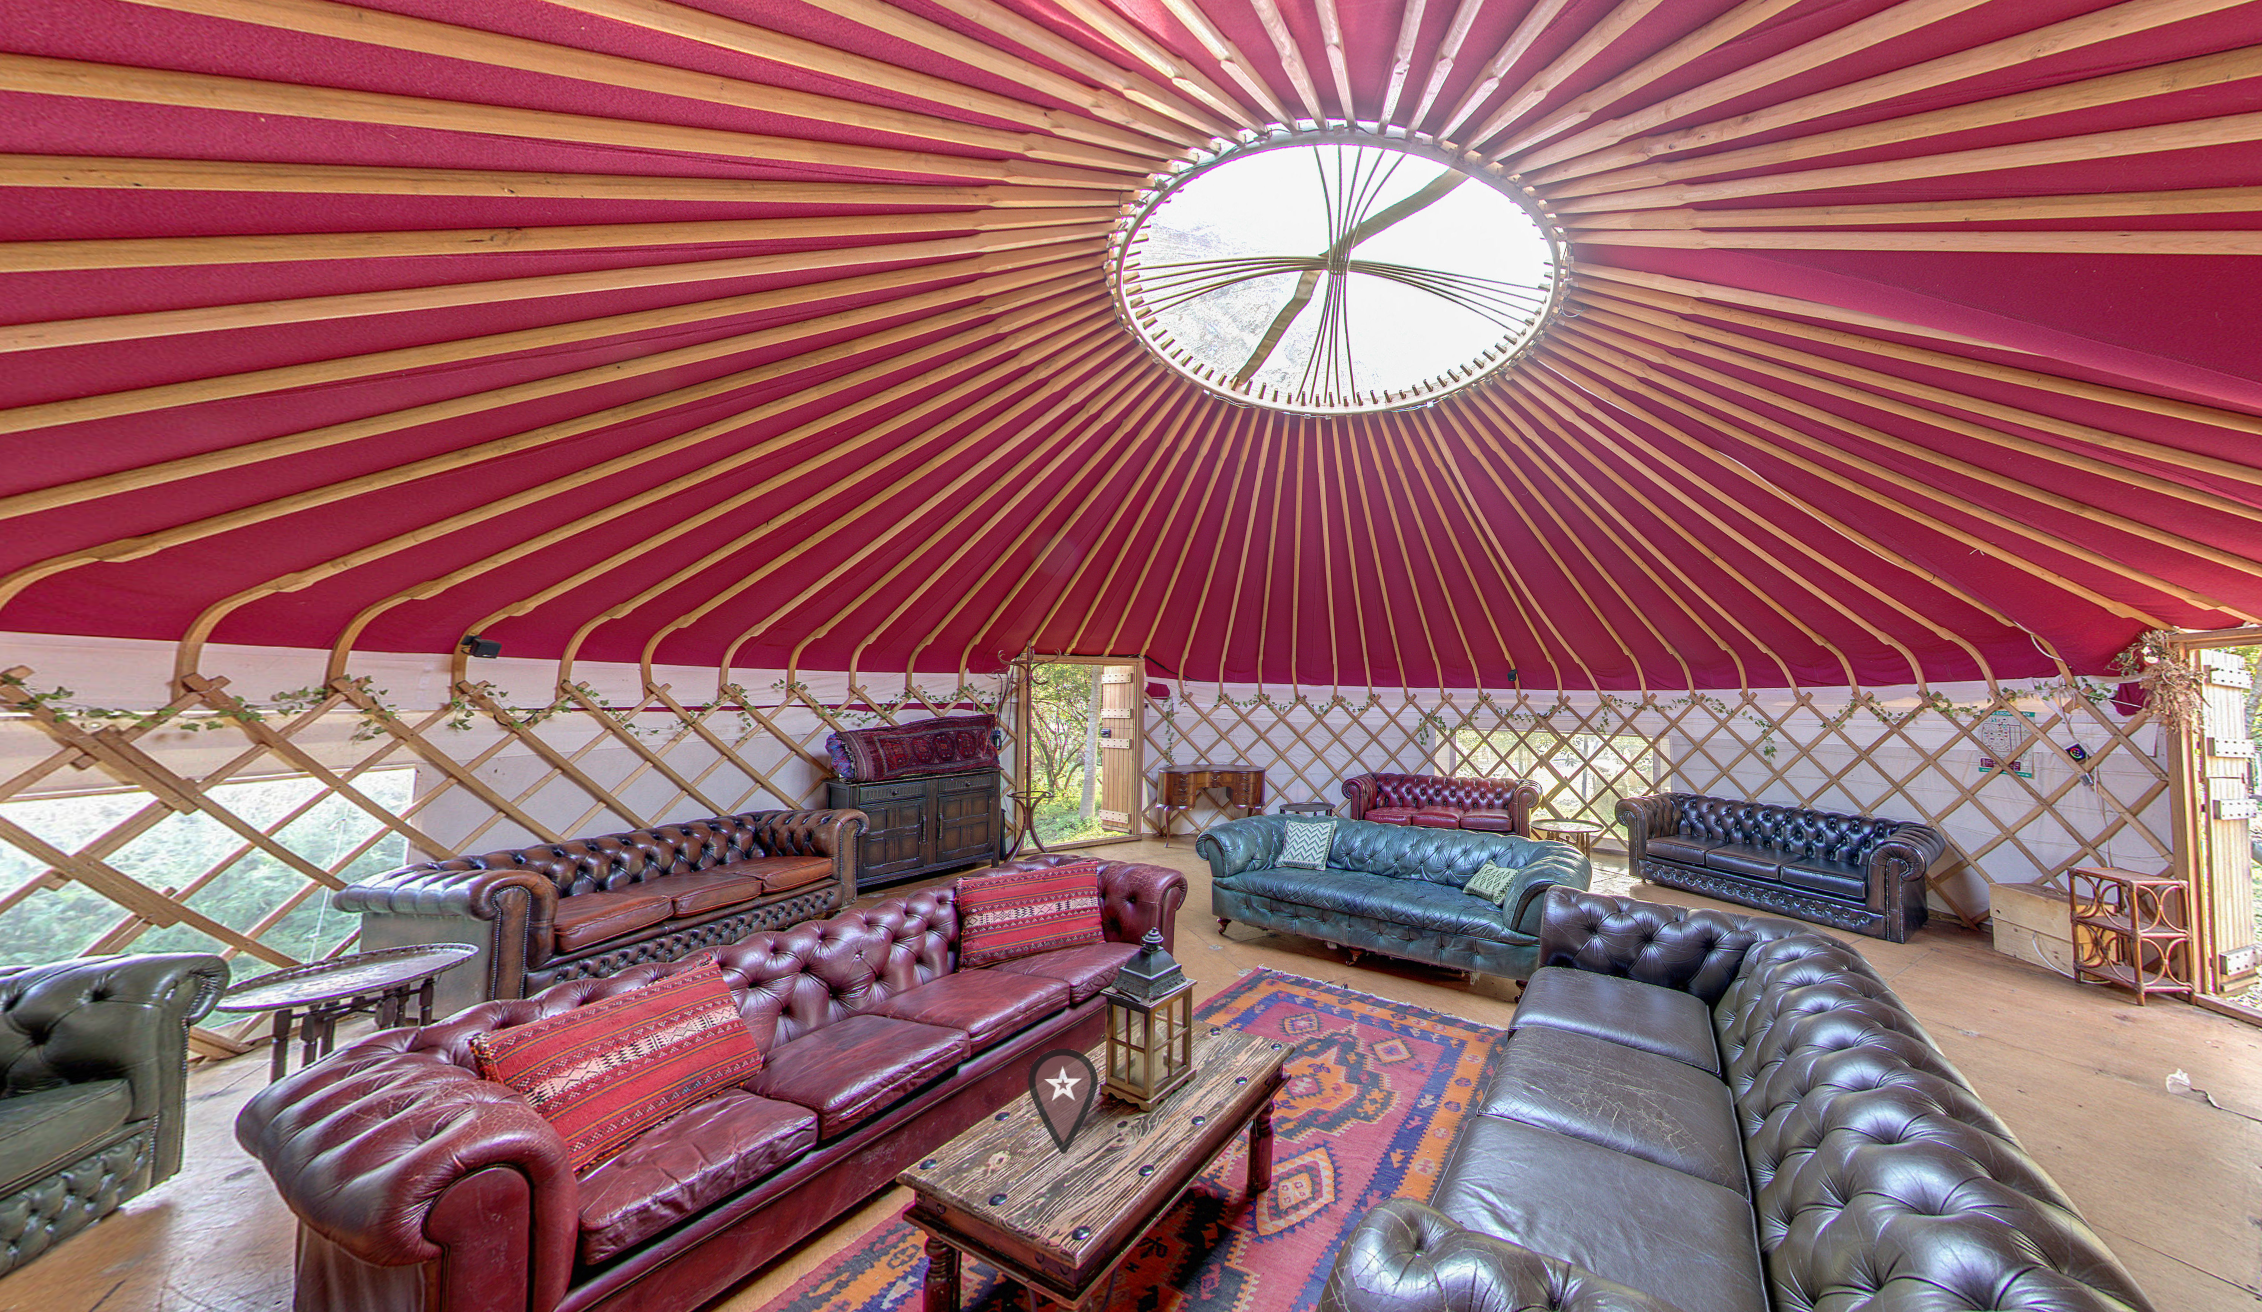 Home Yurt Plush Tents Glamping